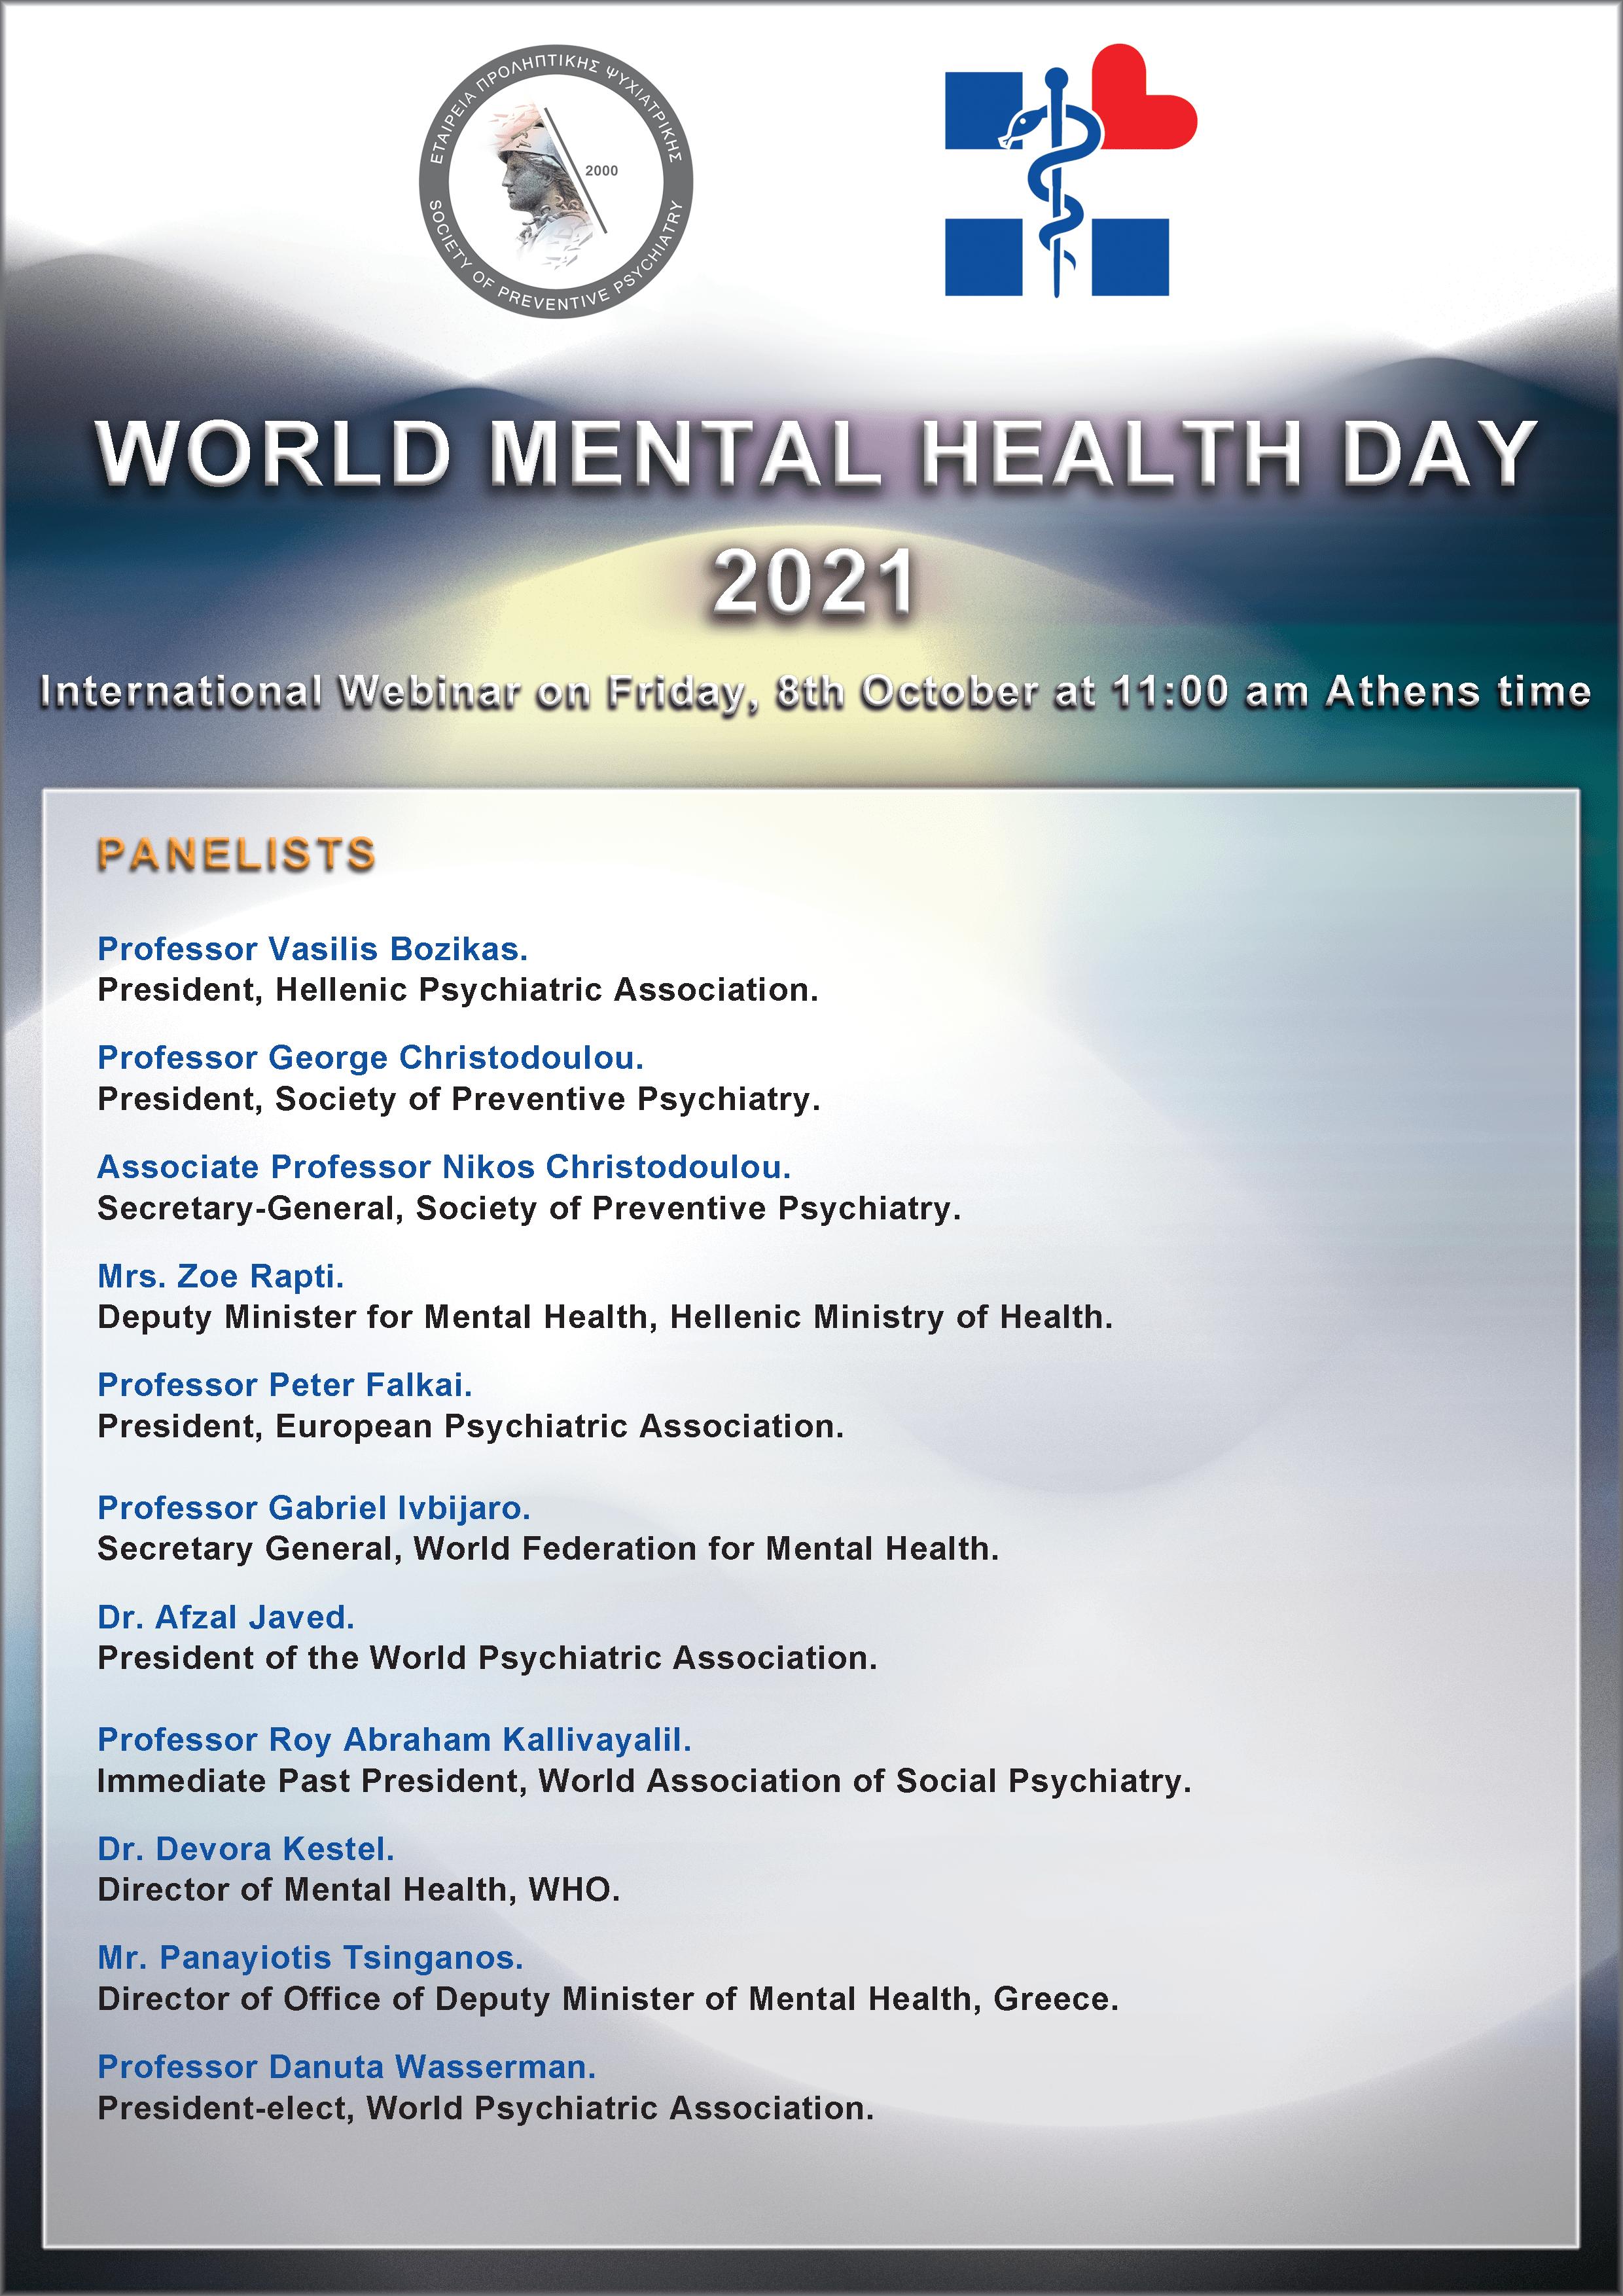 WORLD MENTAL HEALTH DAY 2021 - Panelists.